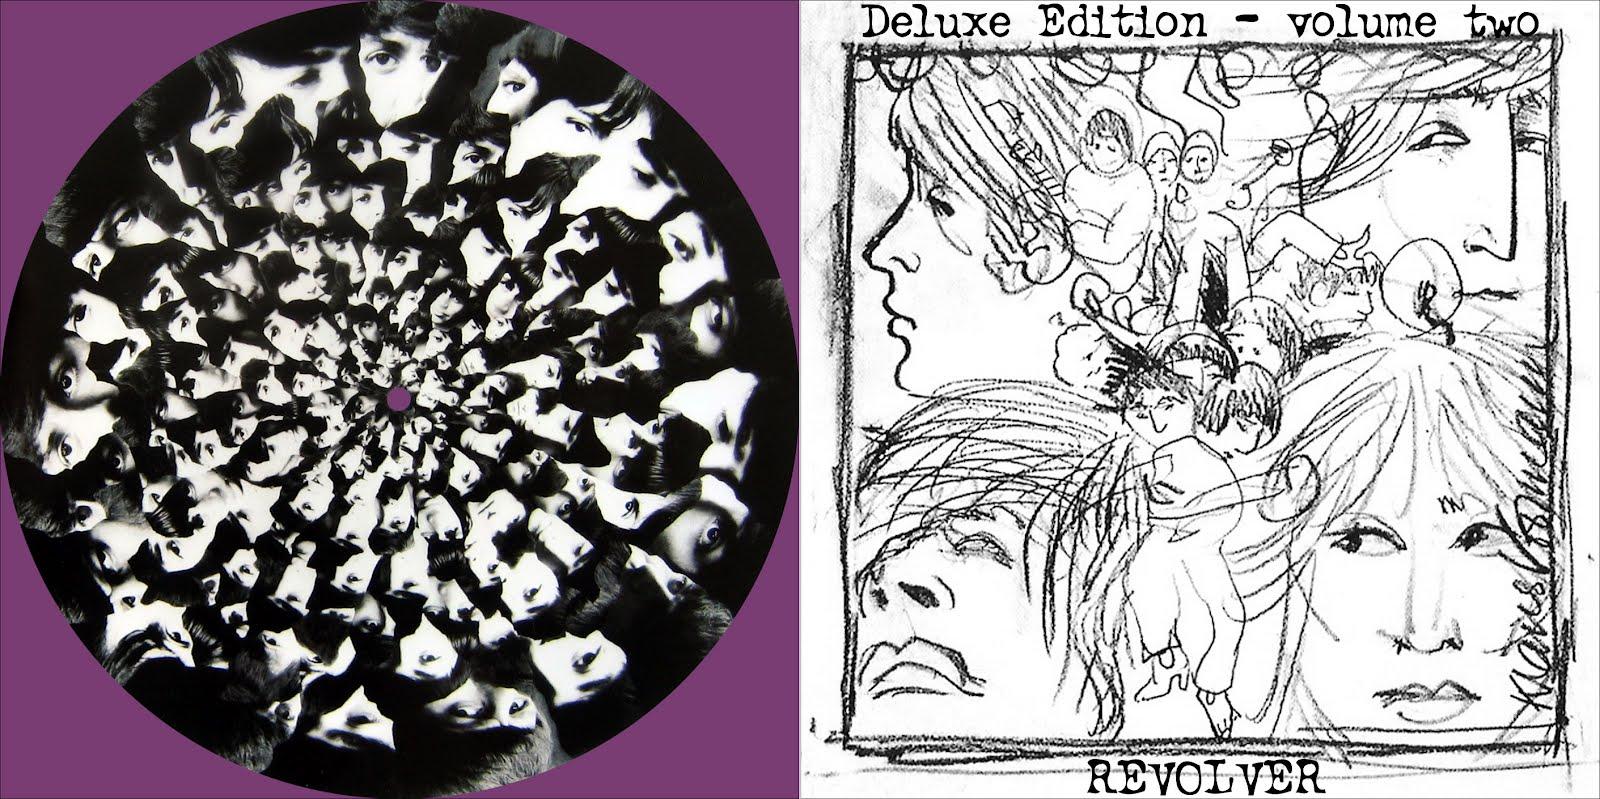 Pee-Pee Soaked Heckhole: The Beatles - Revolver (Purple